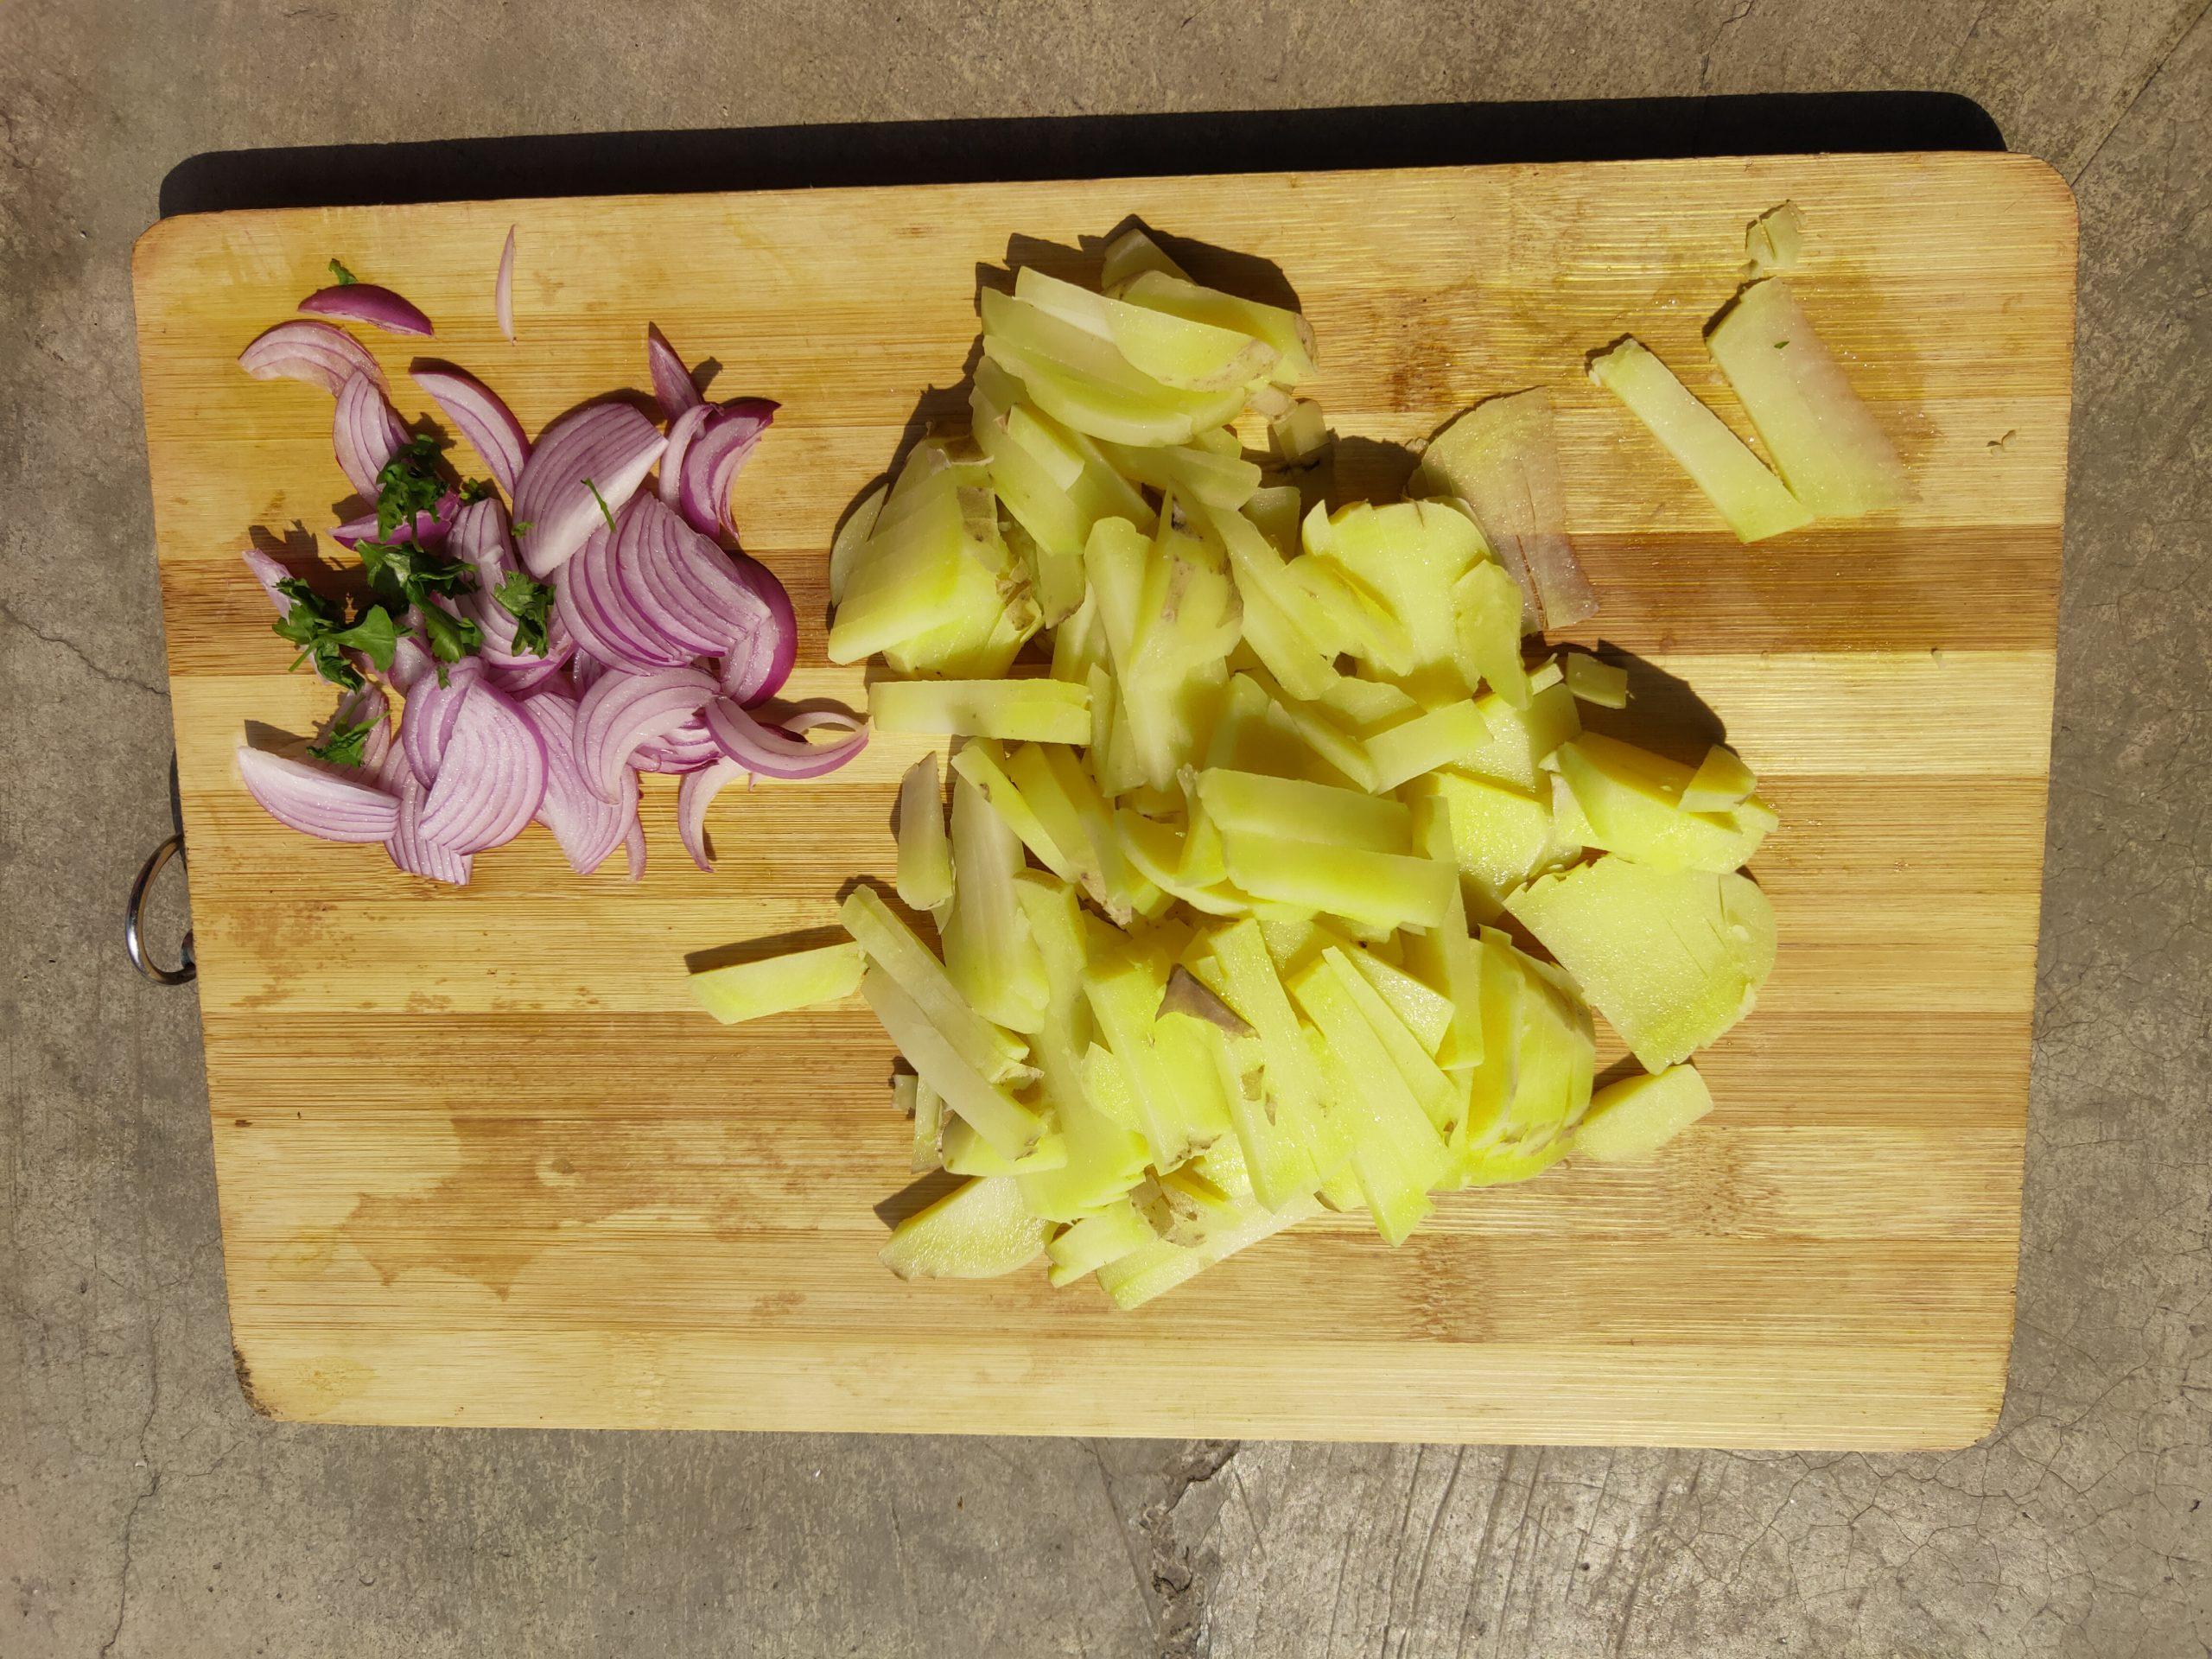 Cut vegetable on wood tray